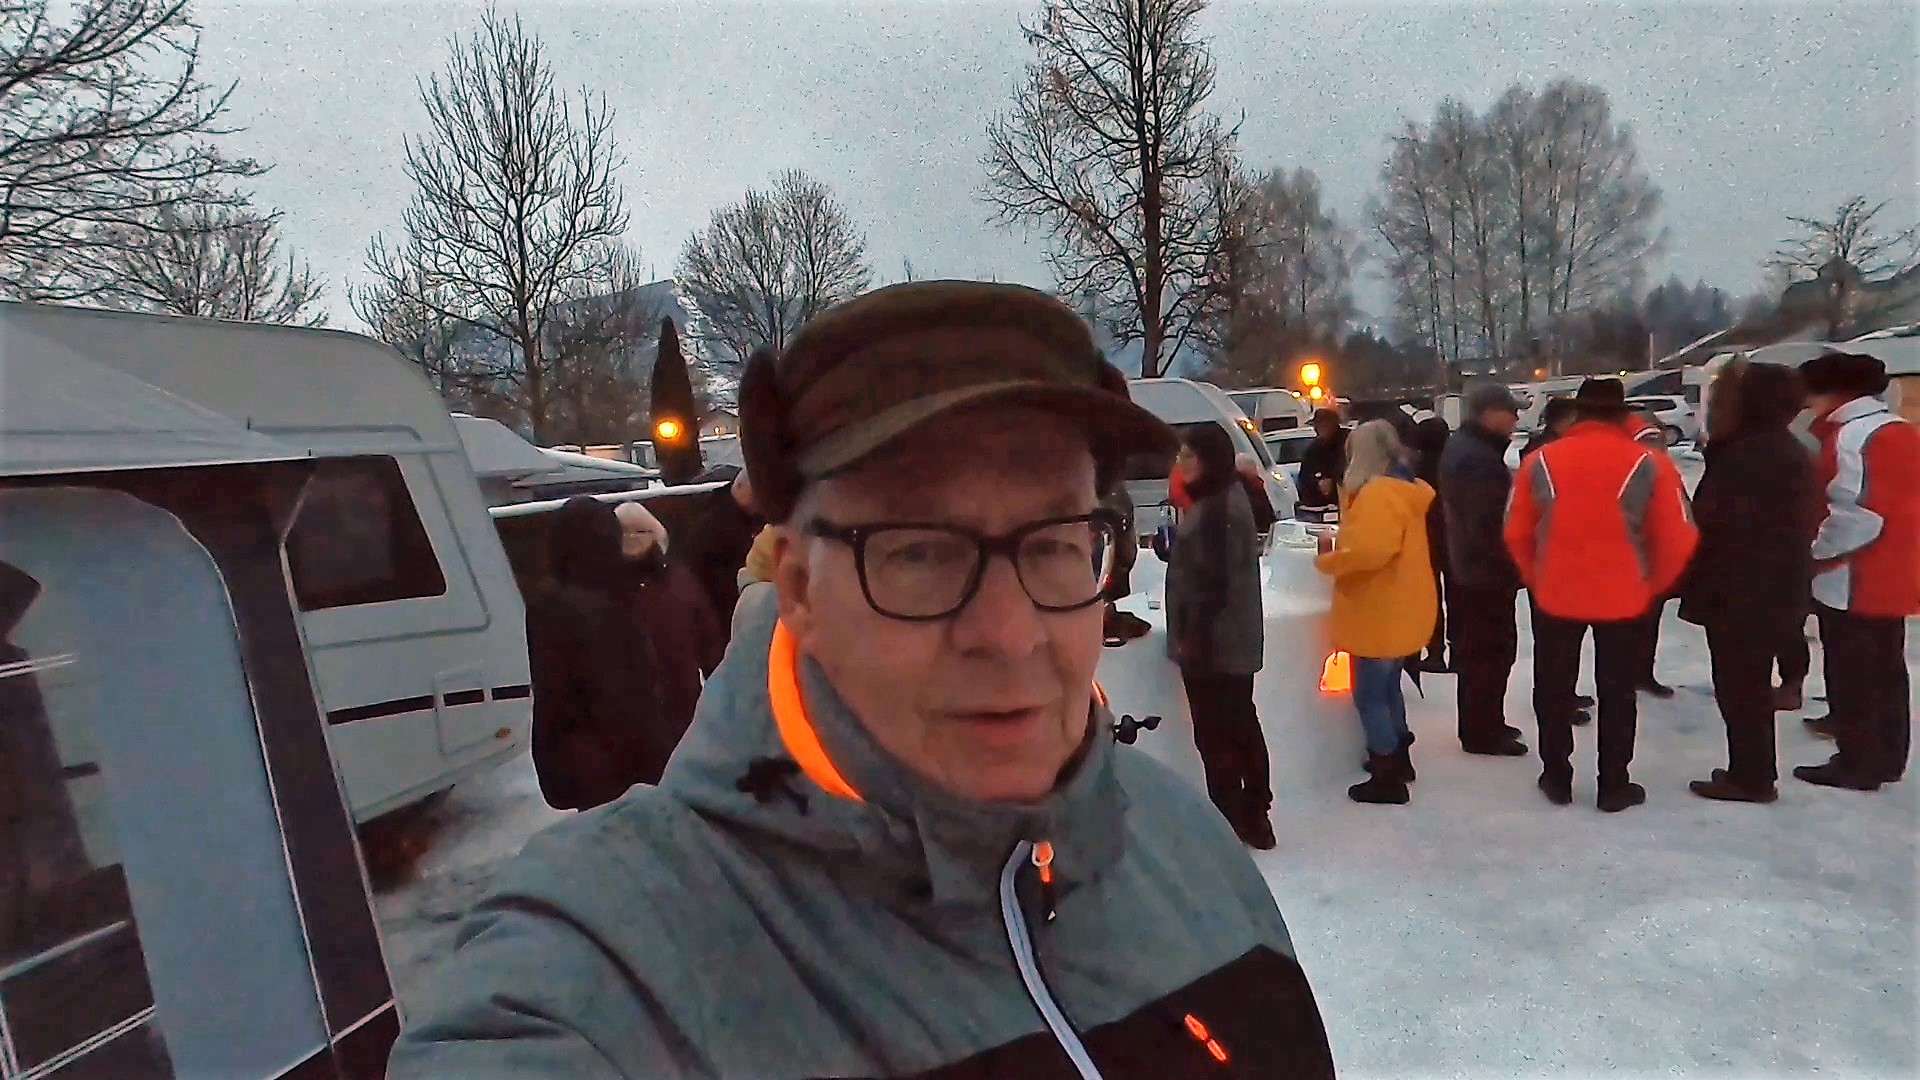 Vintercamping i Østrig - Del 3 - På tur i kreaturvognen